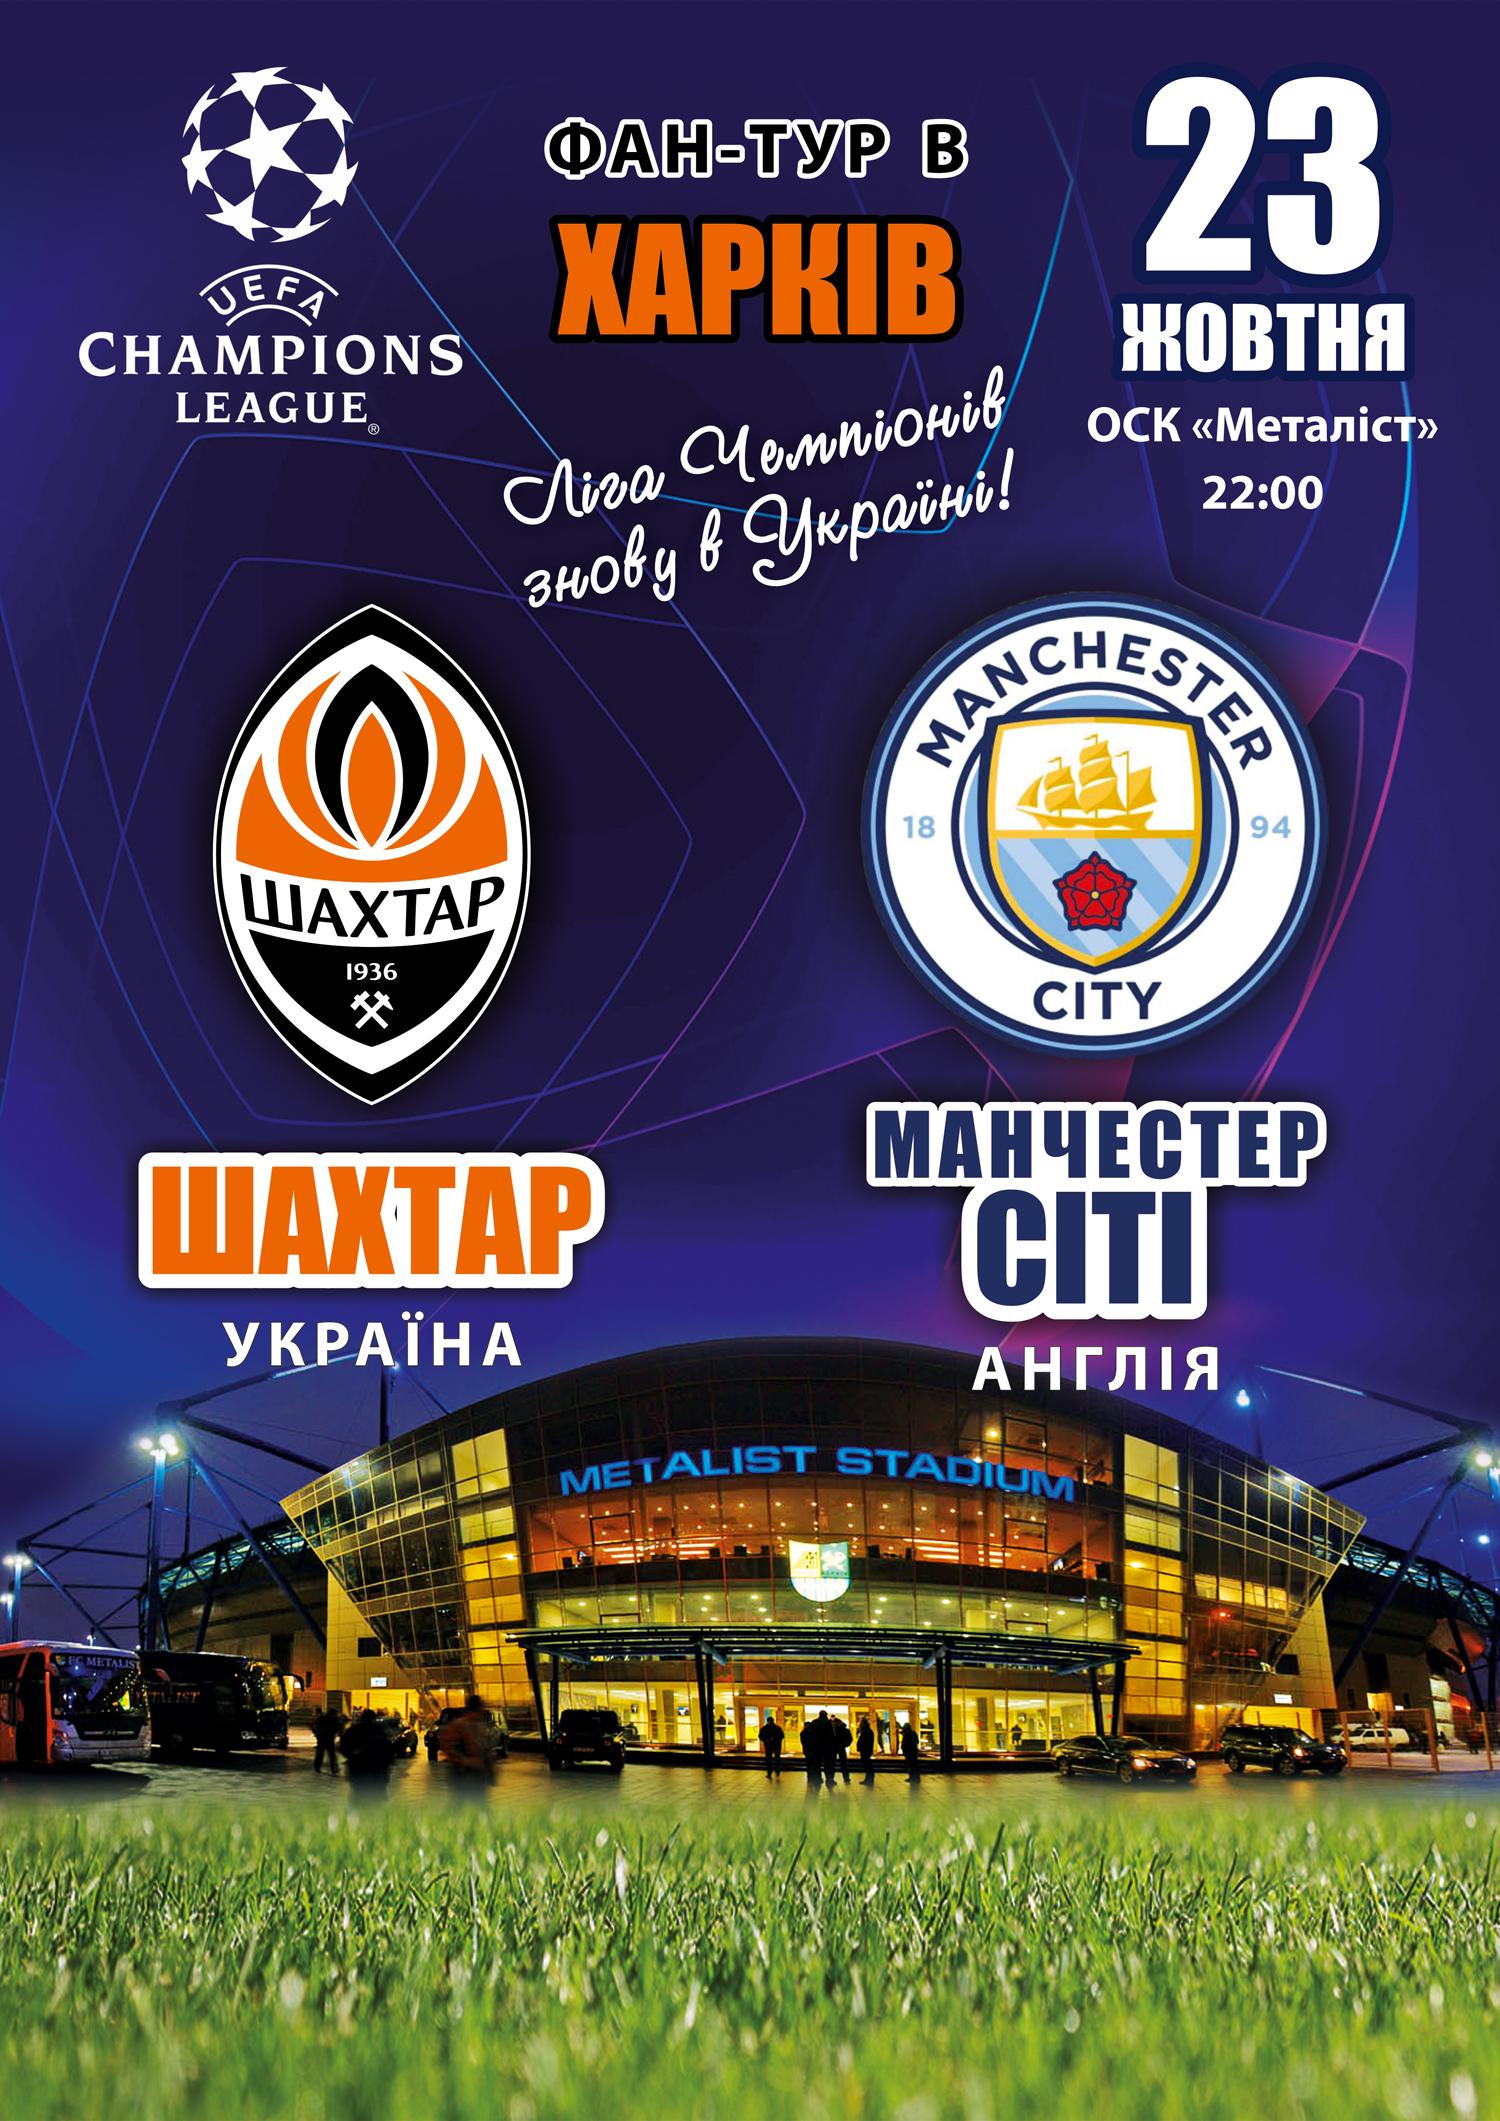 Фан-тур на матч Лиги Чемпионов Шахтер–Манчестер Сити (Одесса)